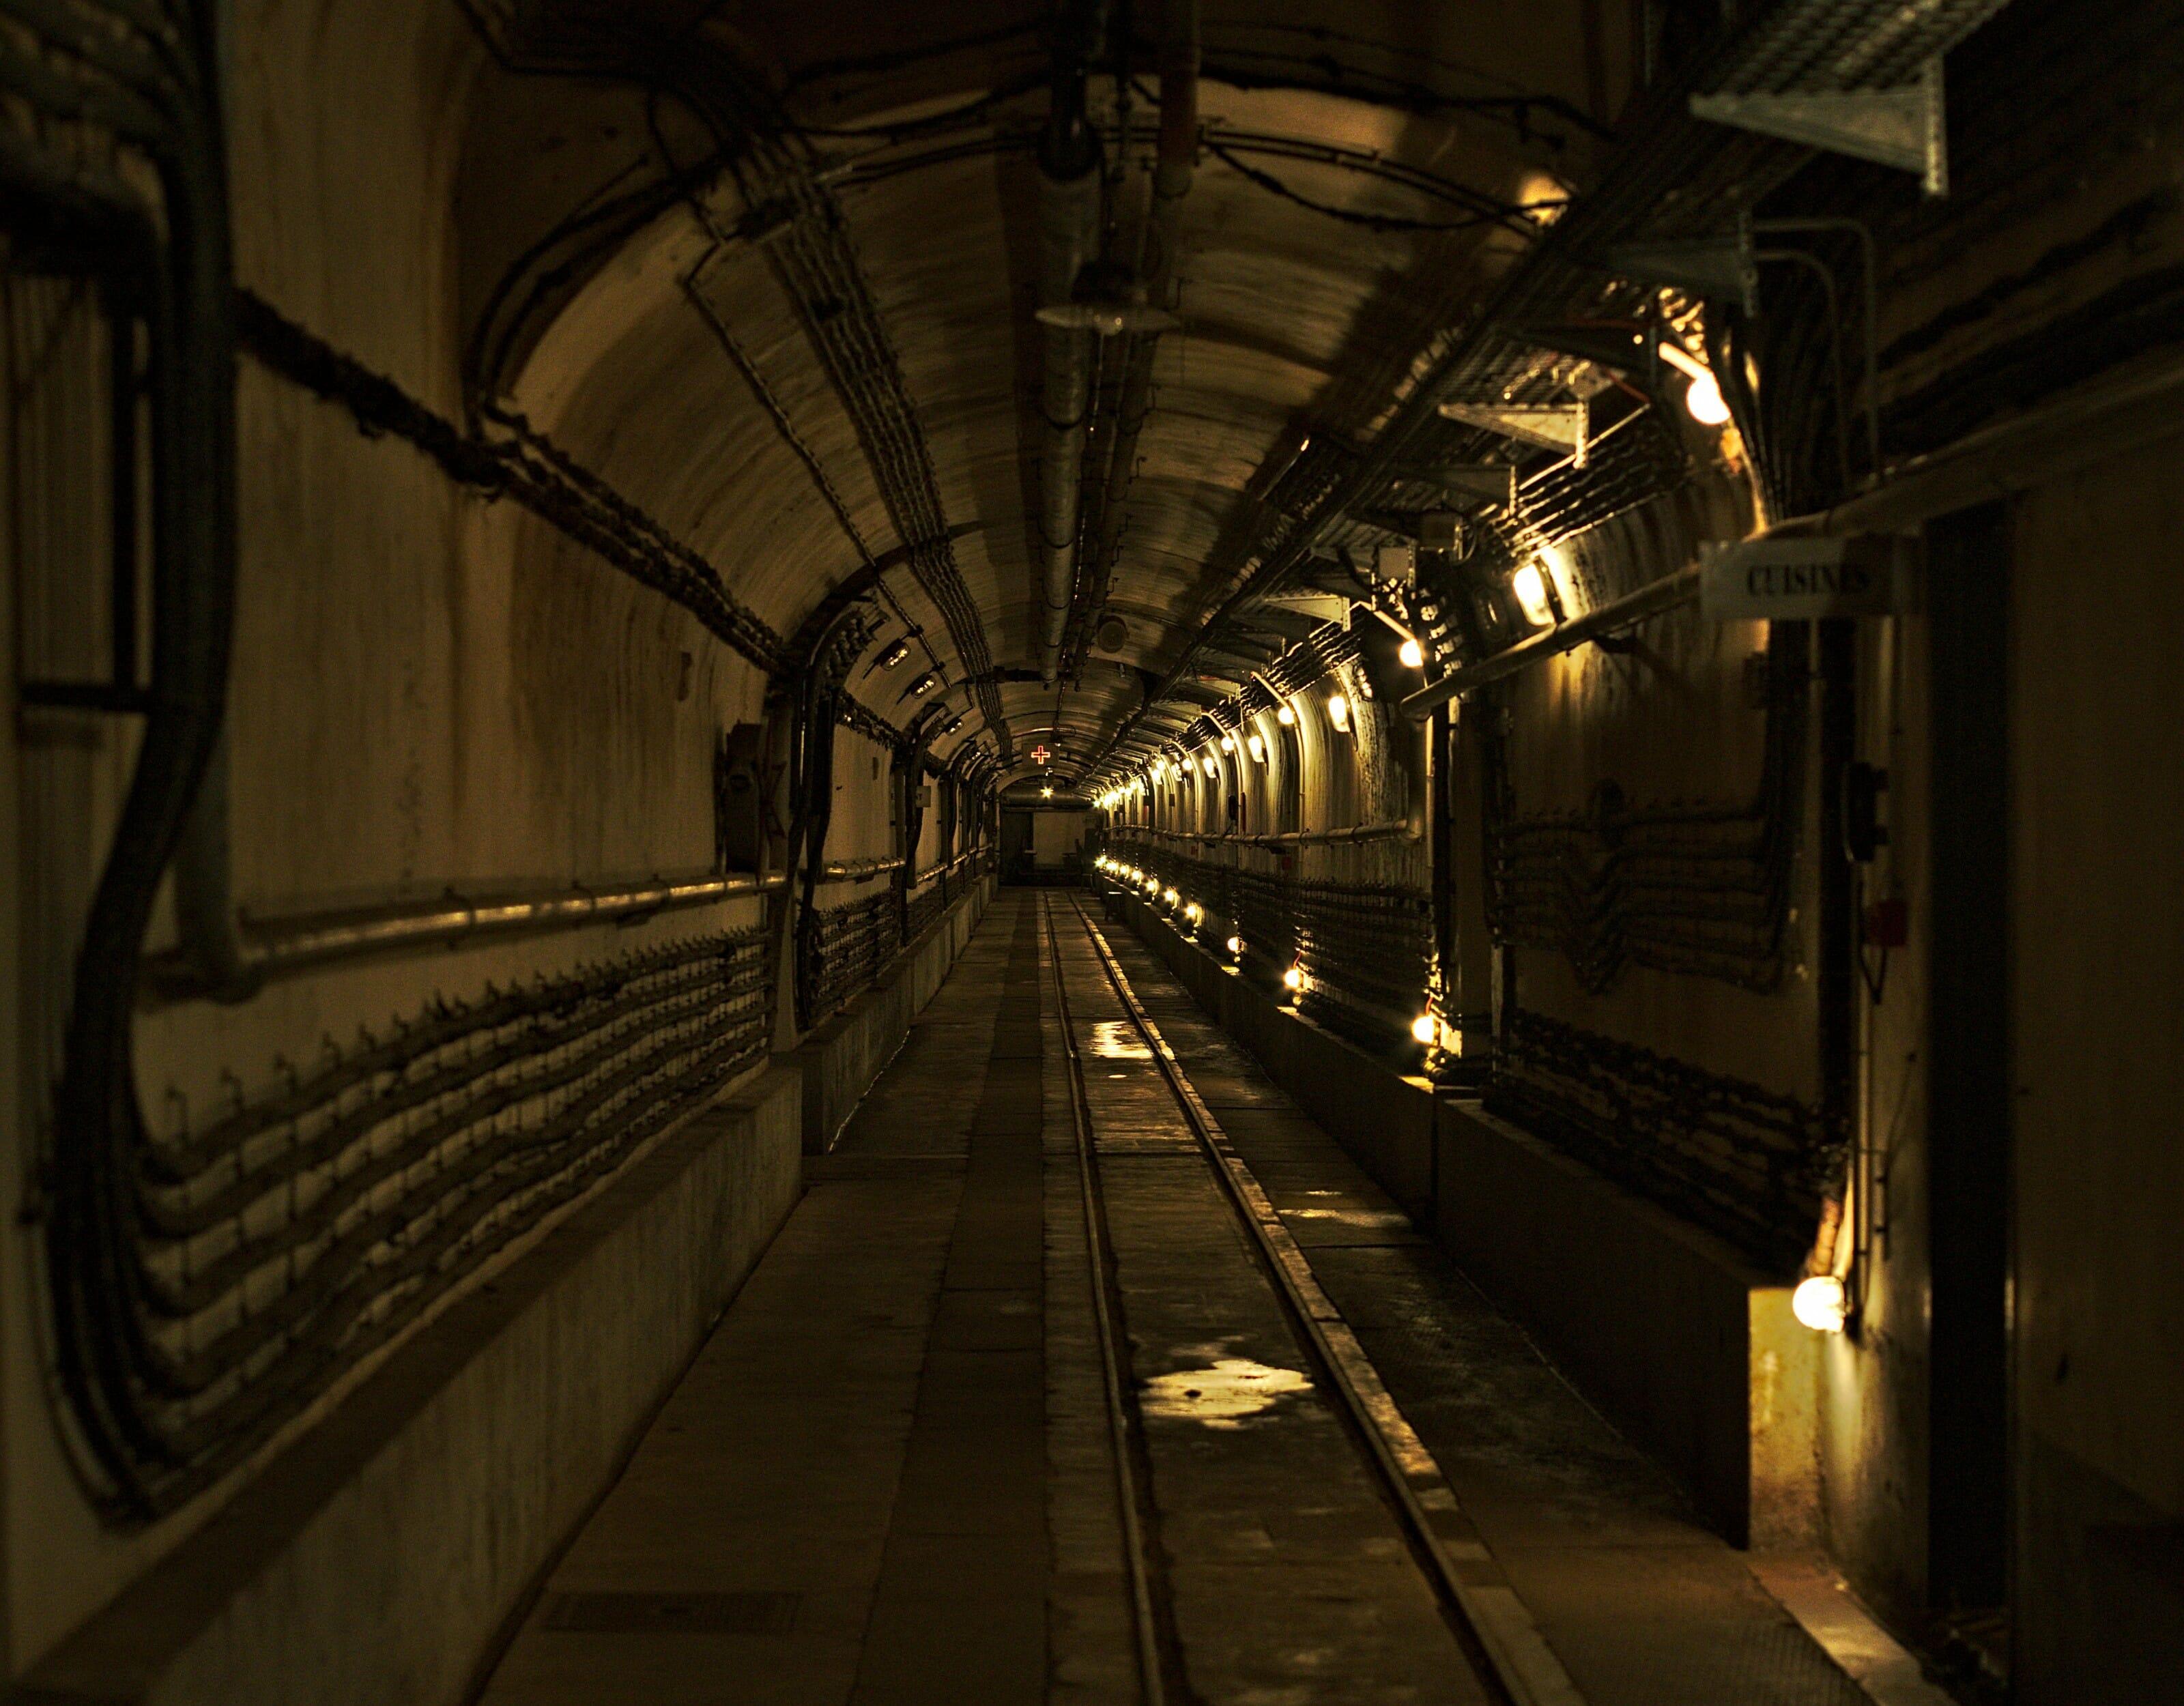 couloir du simserhof